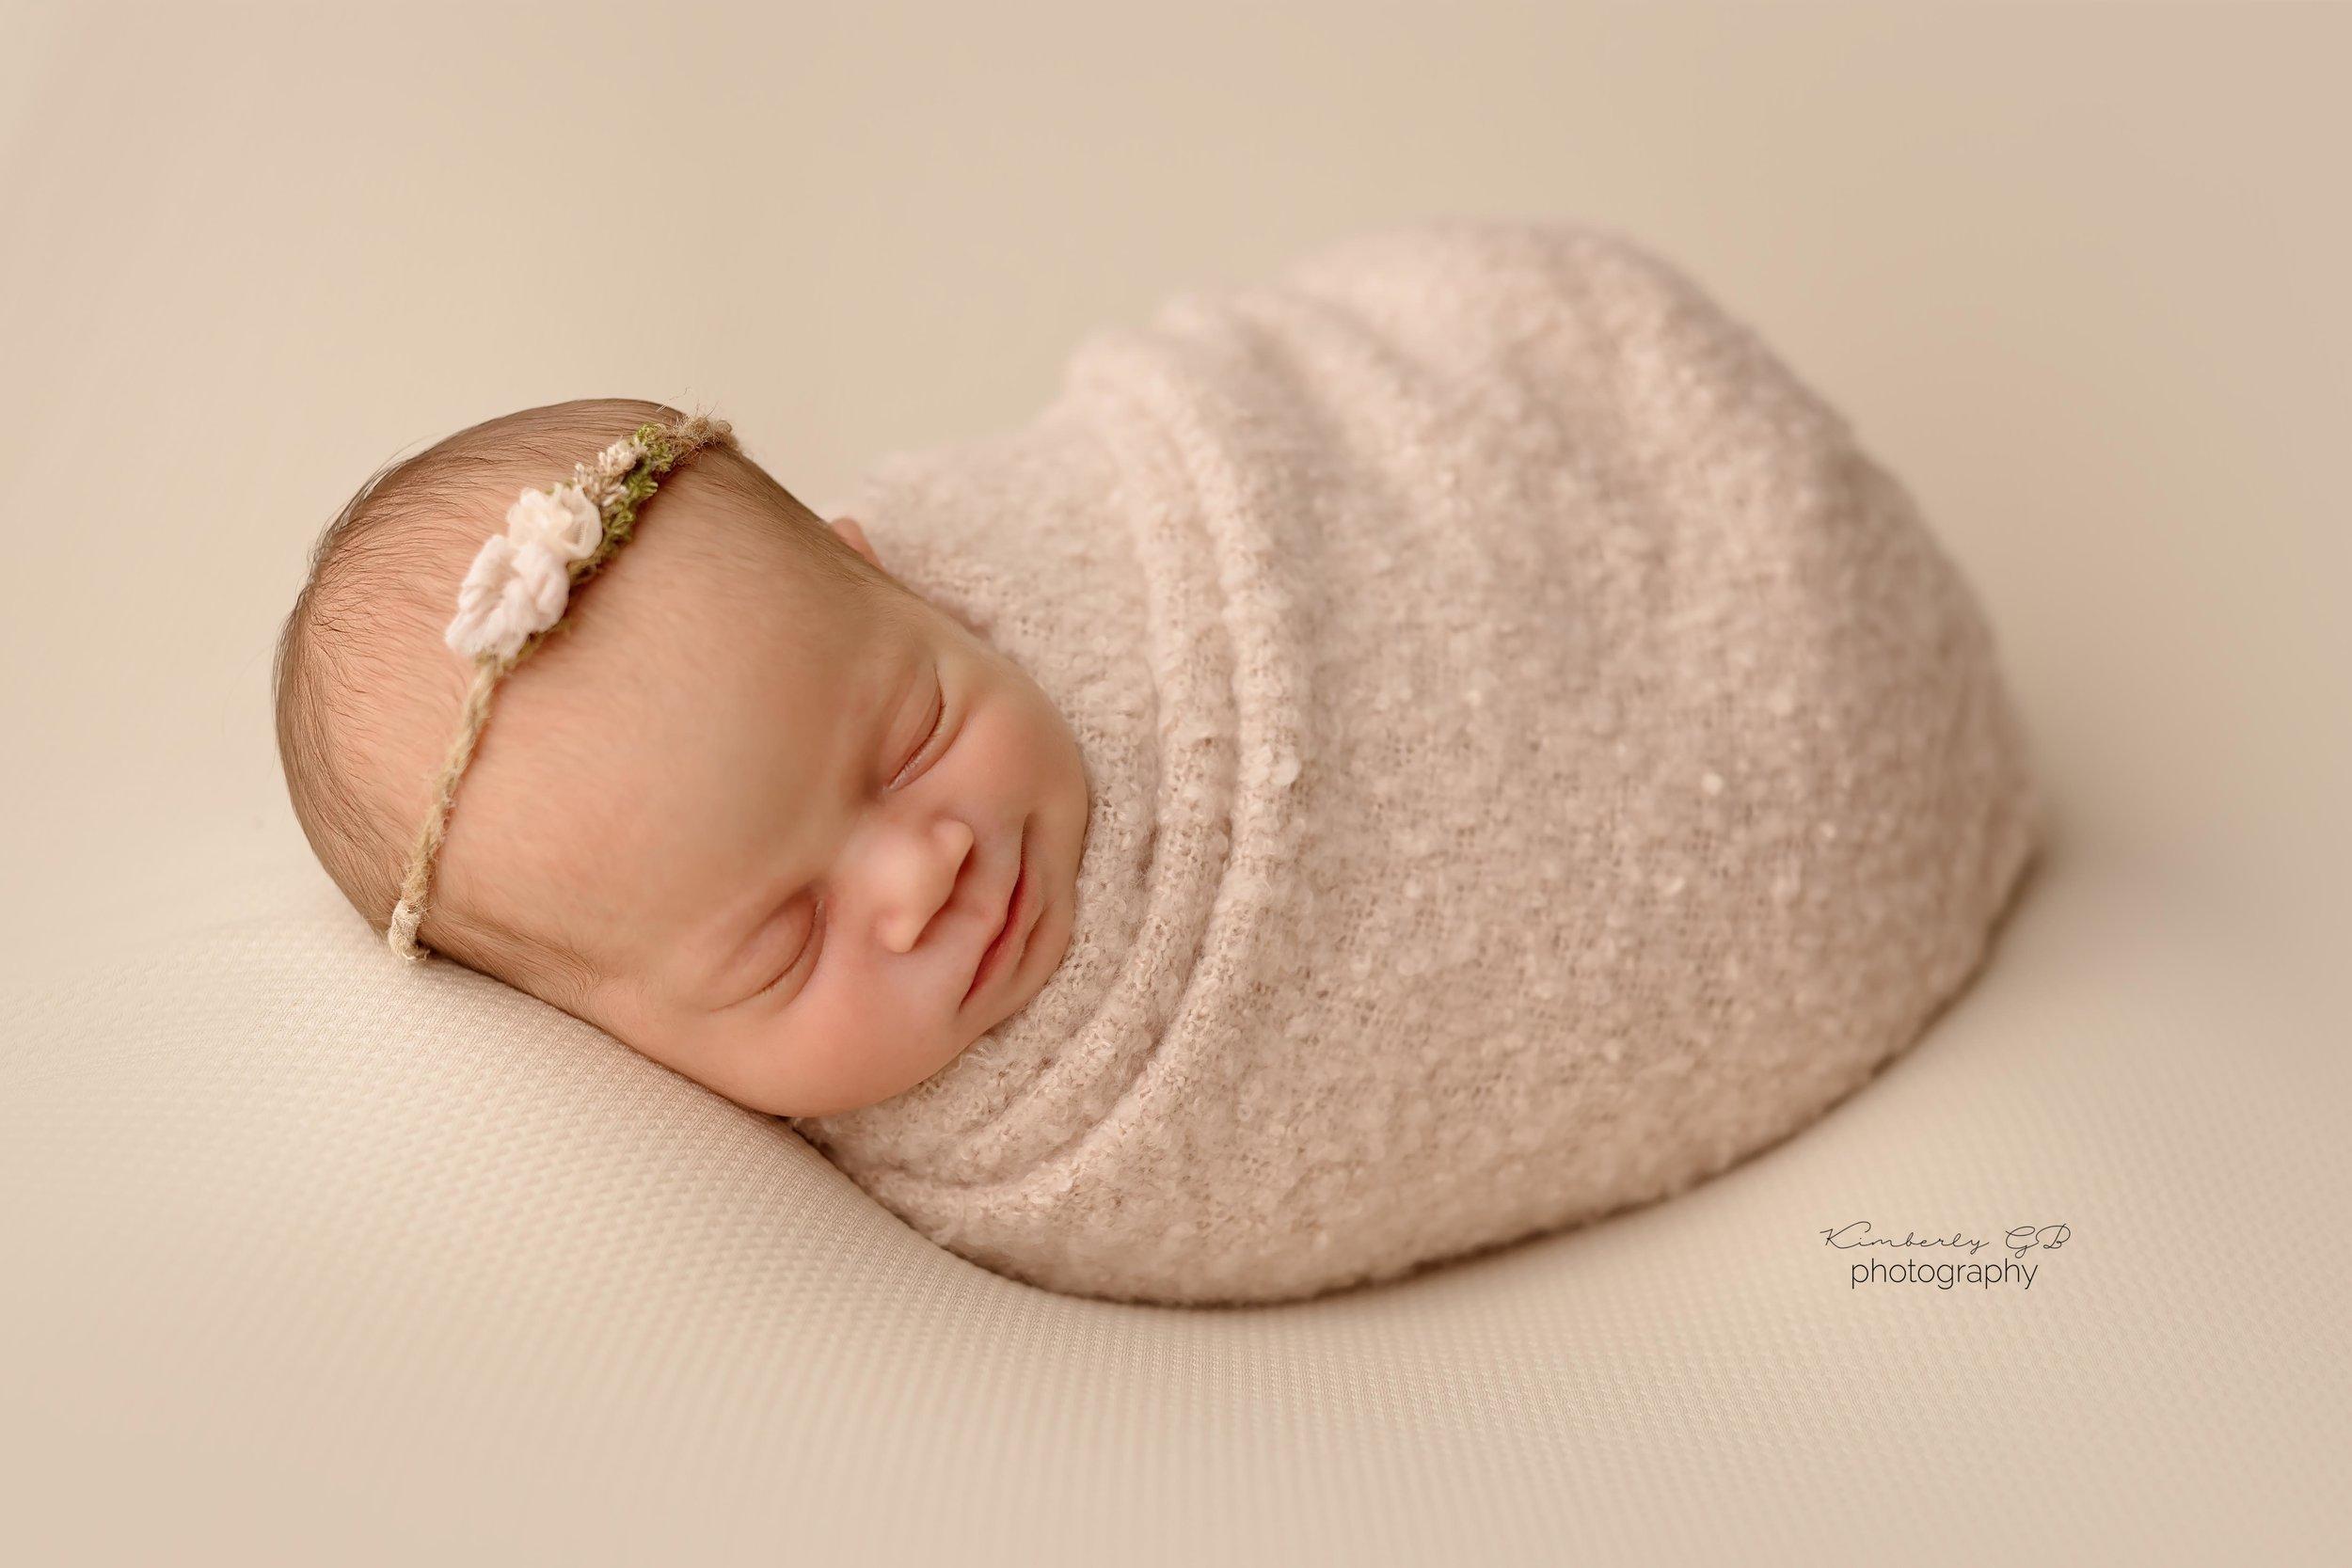 fotografia-de-recien-nacidos-bebes-newborn-en-puerto-rico-kimberly-gb-photography-fotografa-154.jpg